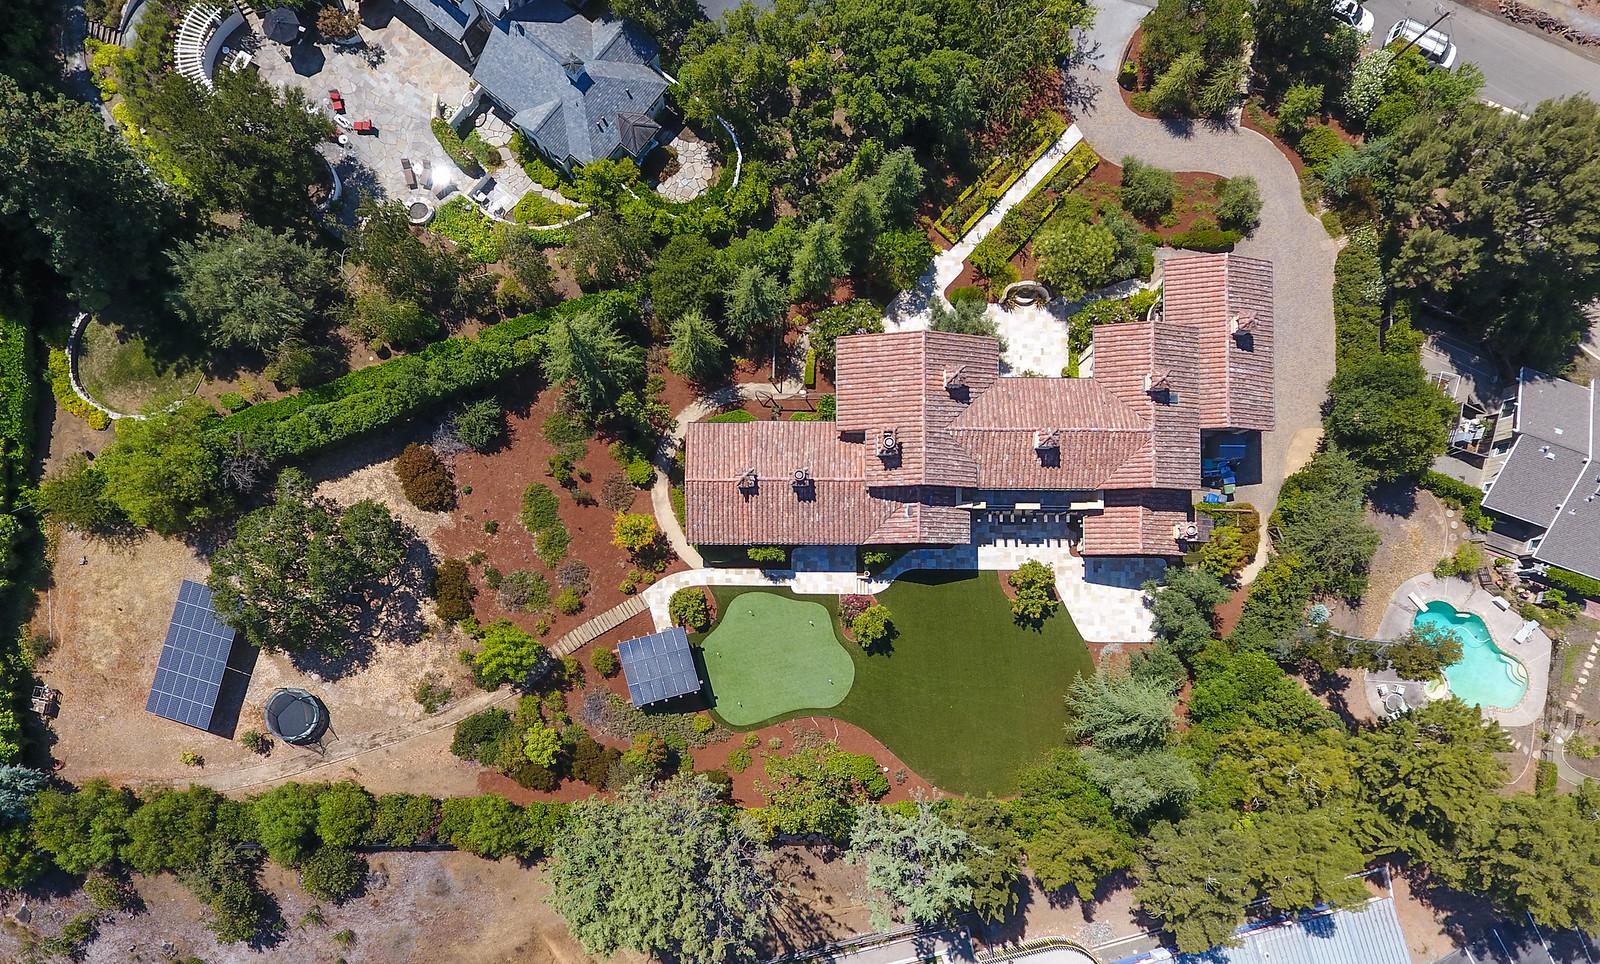 13936 Fremont Pines Ln Drone Los Altos Hills Blu Skye Media Drone-0019-X3.jpg